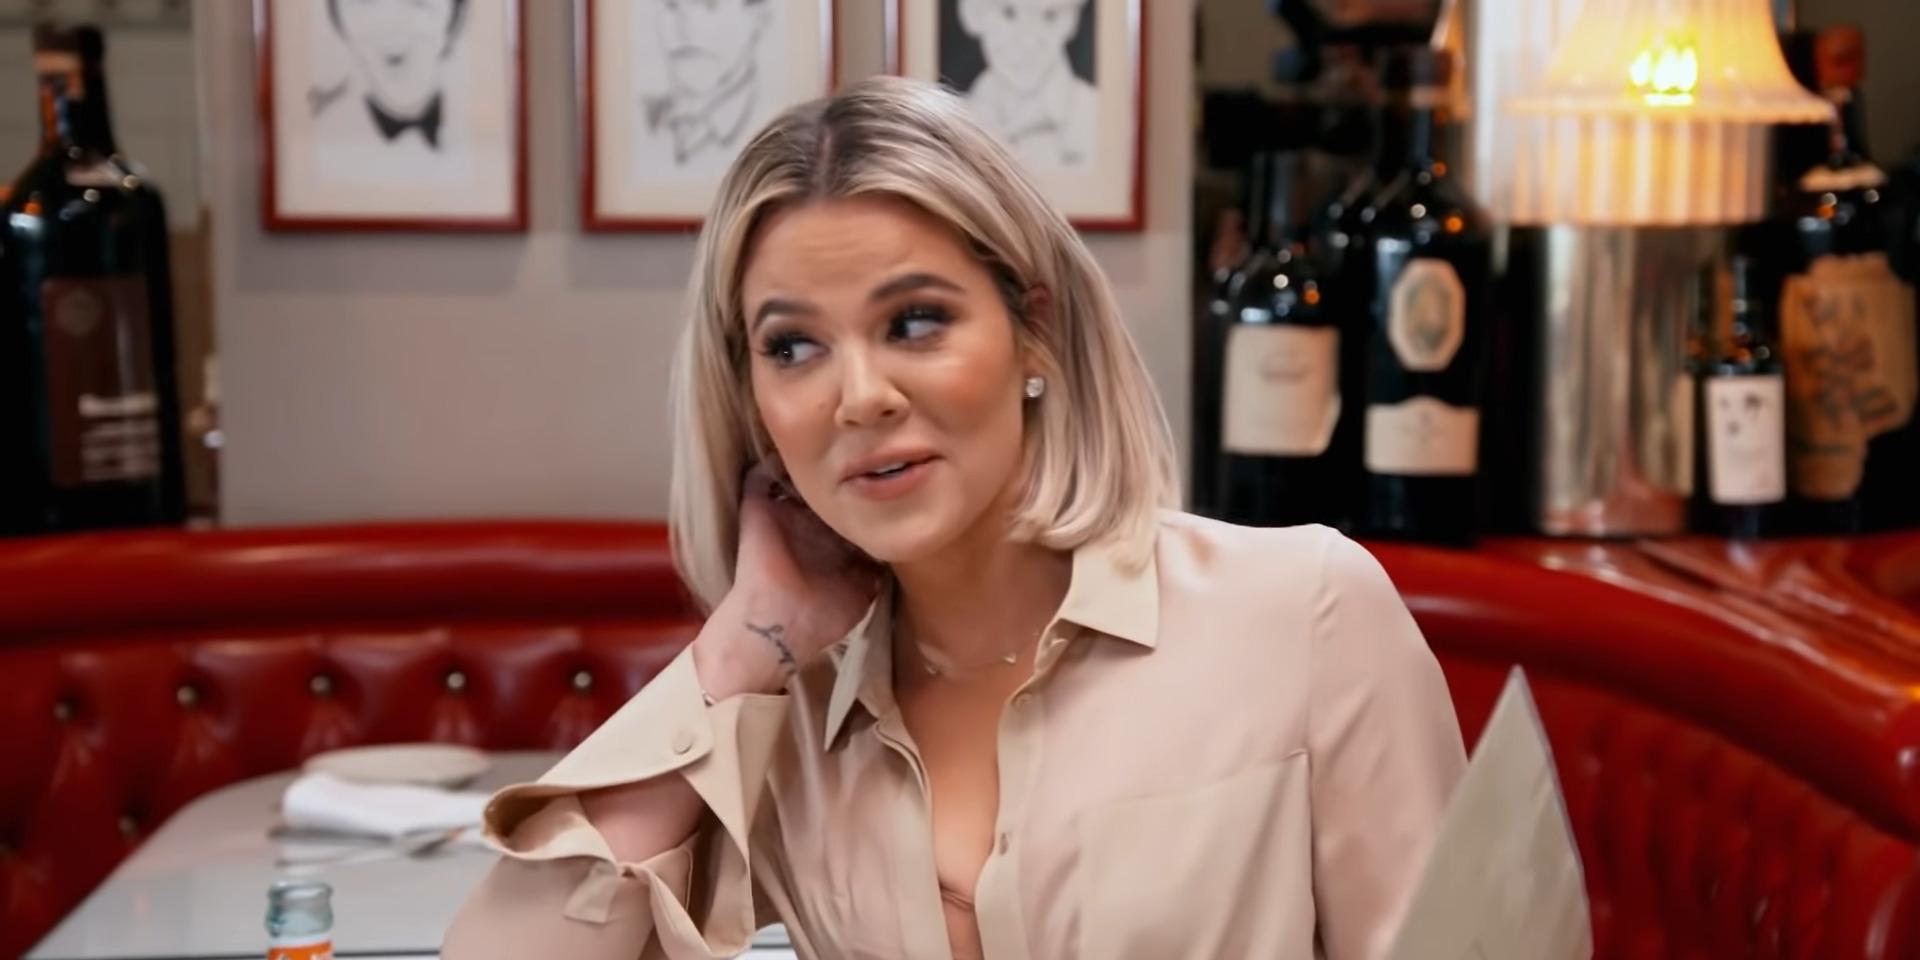 Keeping Up with The Kardashians Season 18 Episode 7